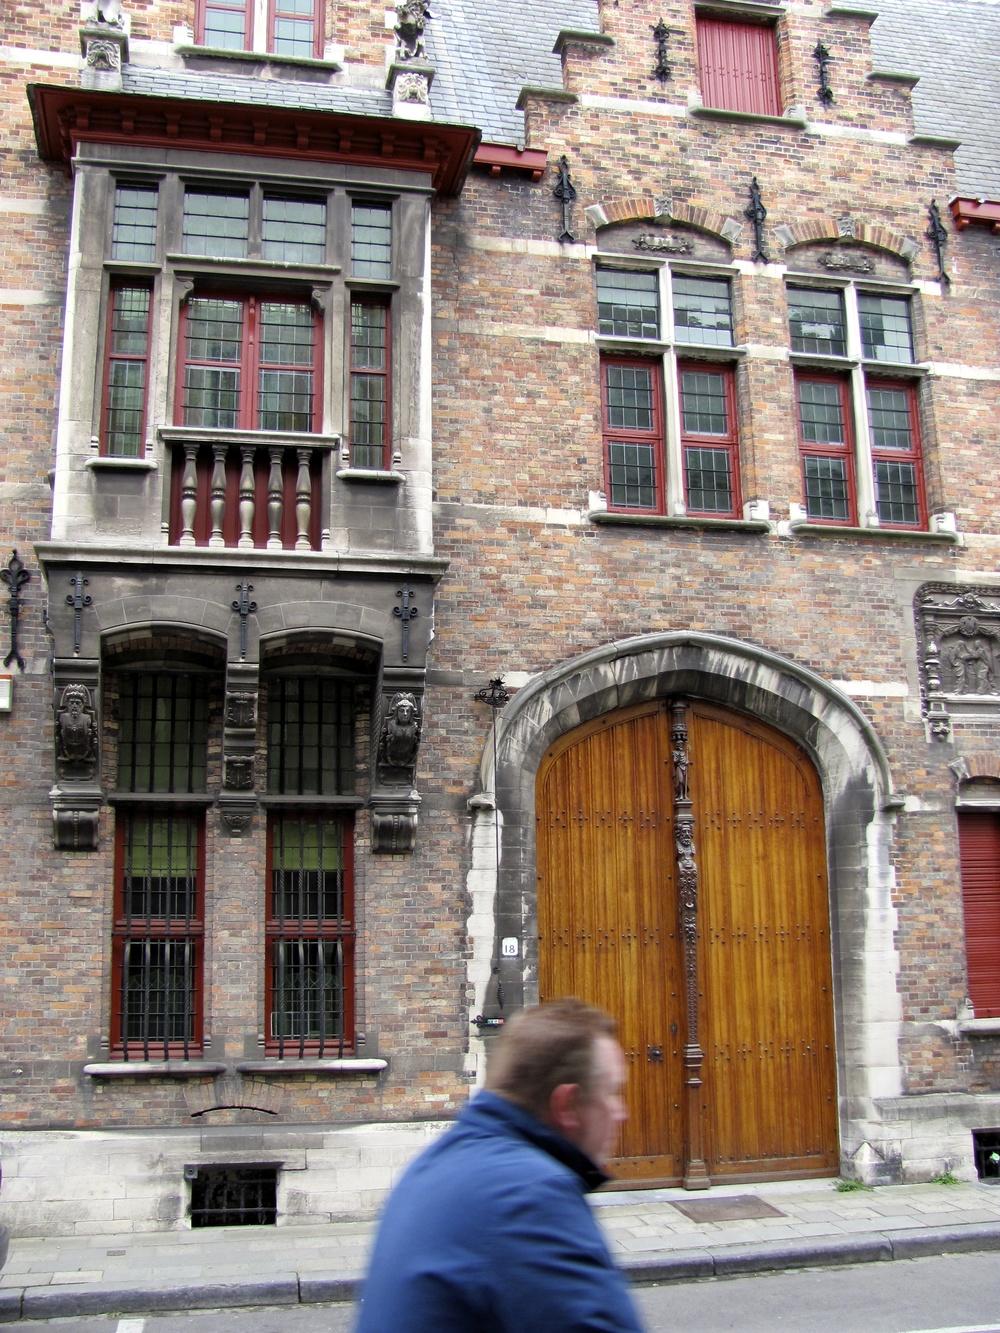 Detailed residential facade, Bruges, Belgium, VHS 2010